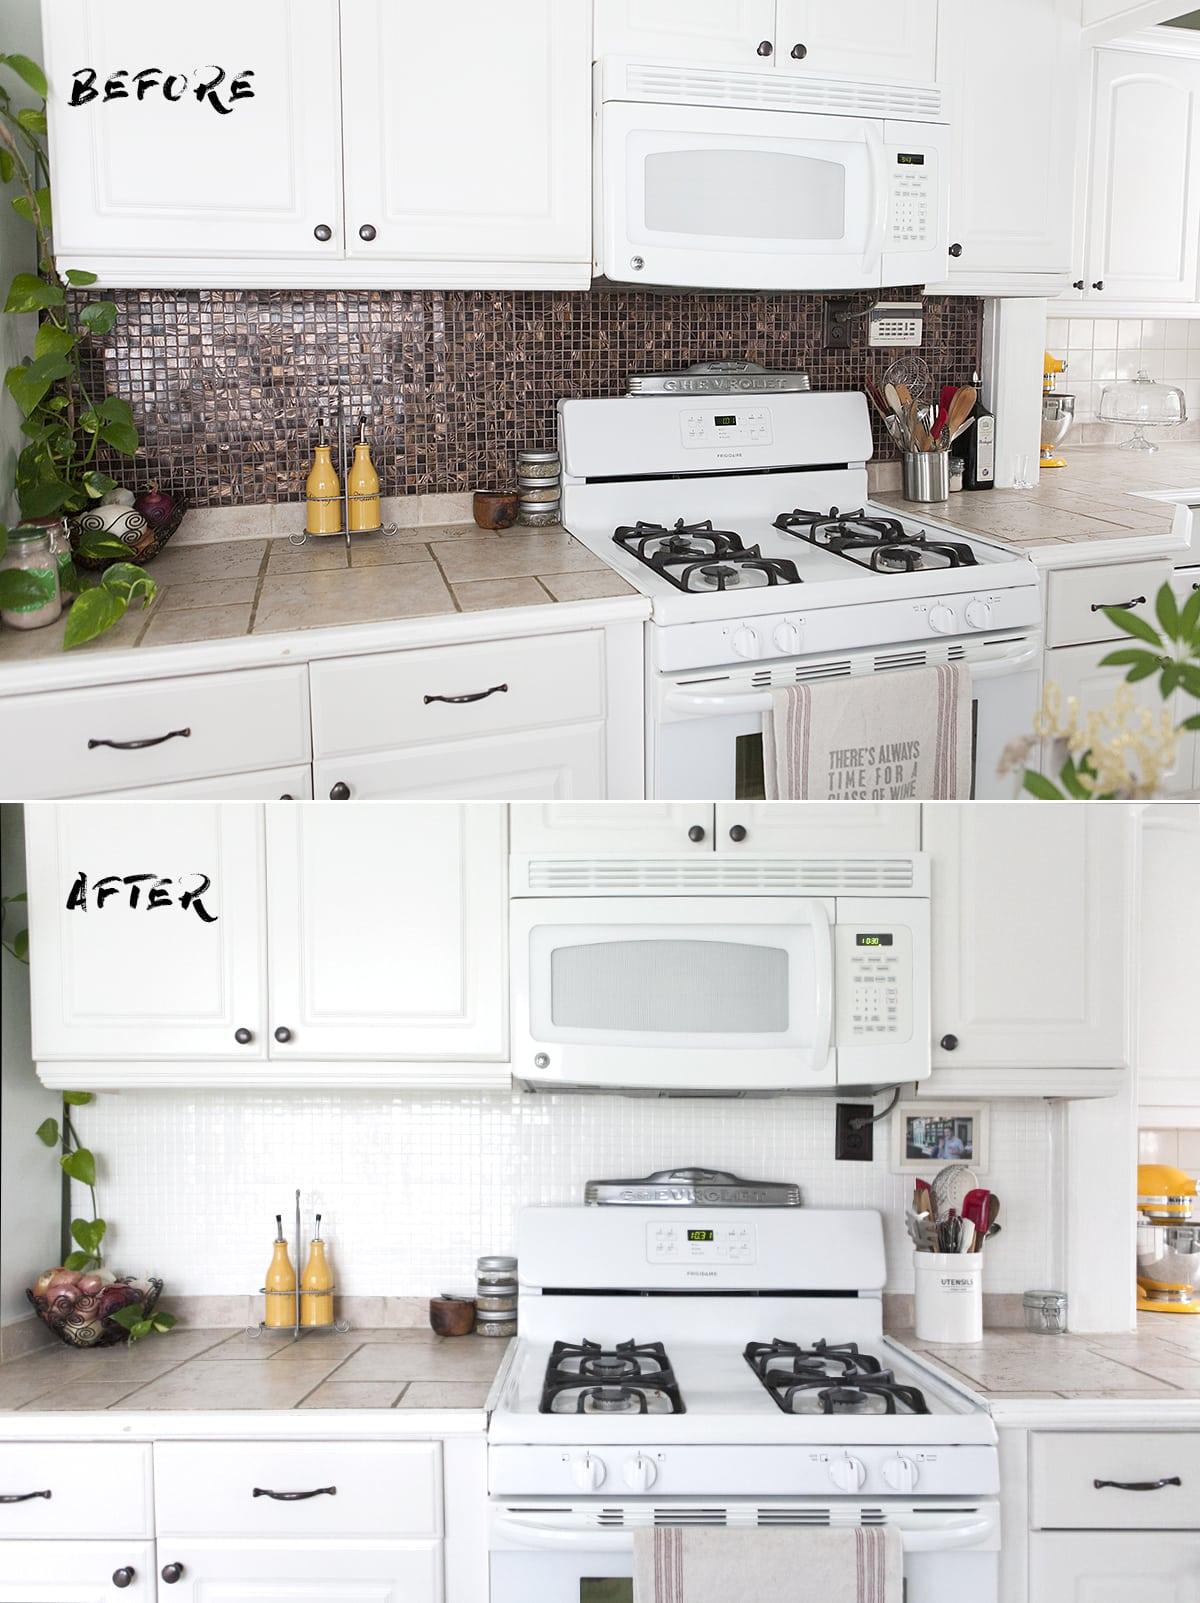 - How To Paint A Tile Backsplash » Jessica Brigham